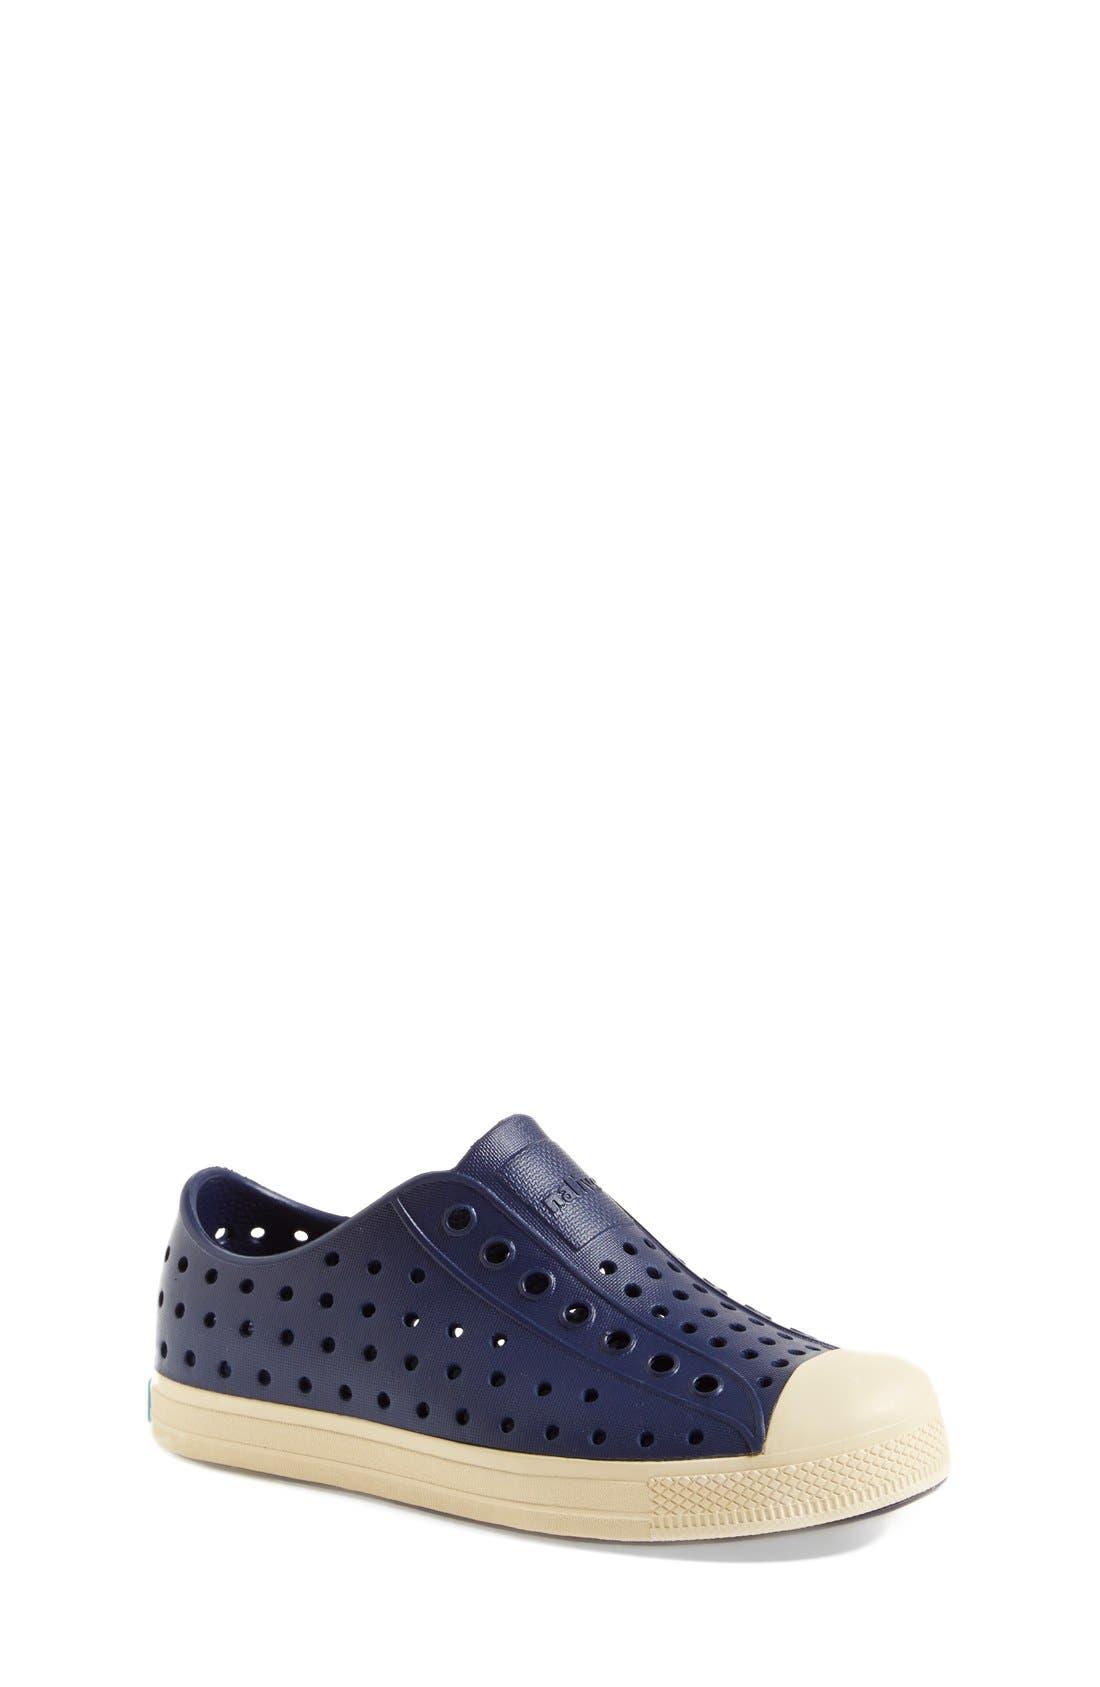 'Jefferson' Water Friendly Slip-On Sneaker,                             Main thumbnail 44, color,